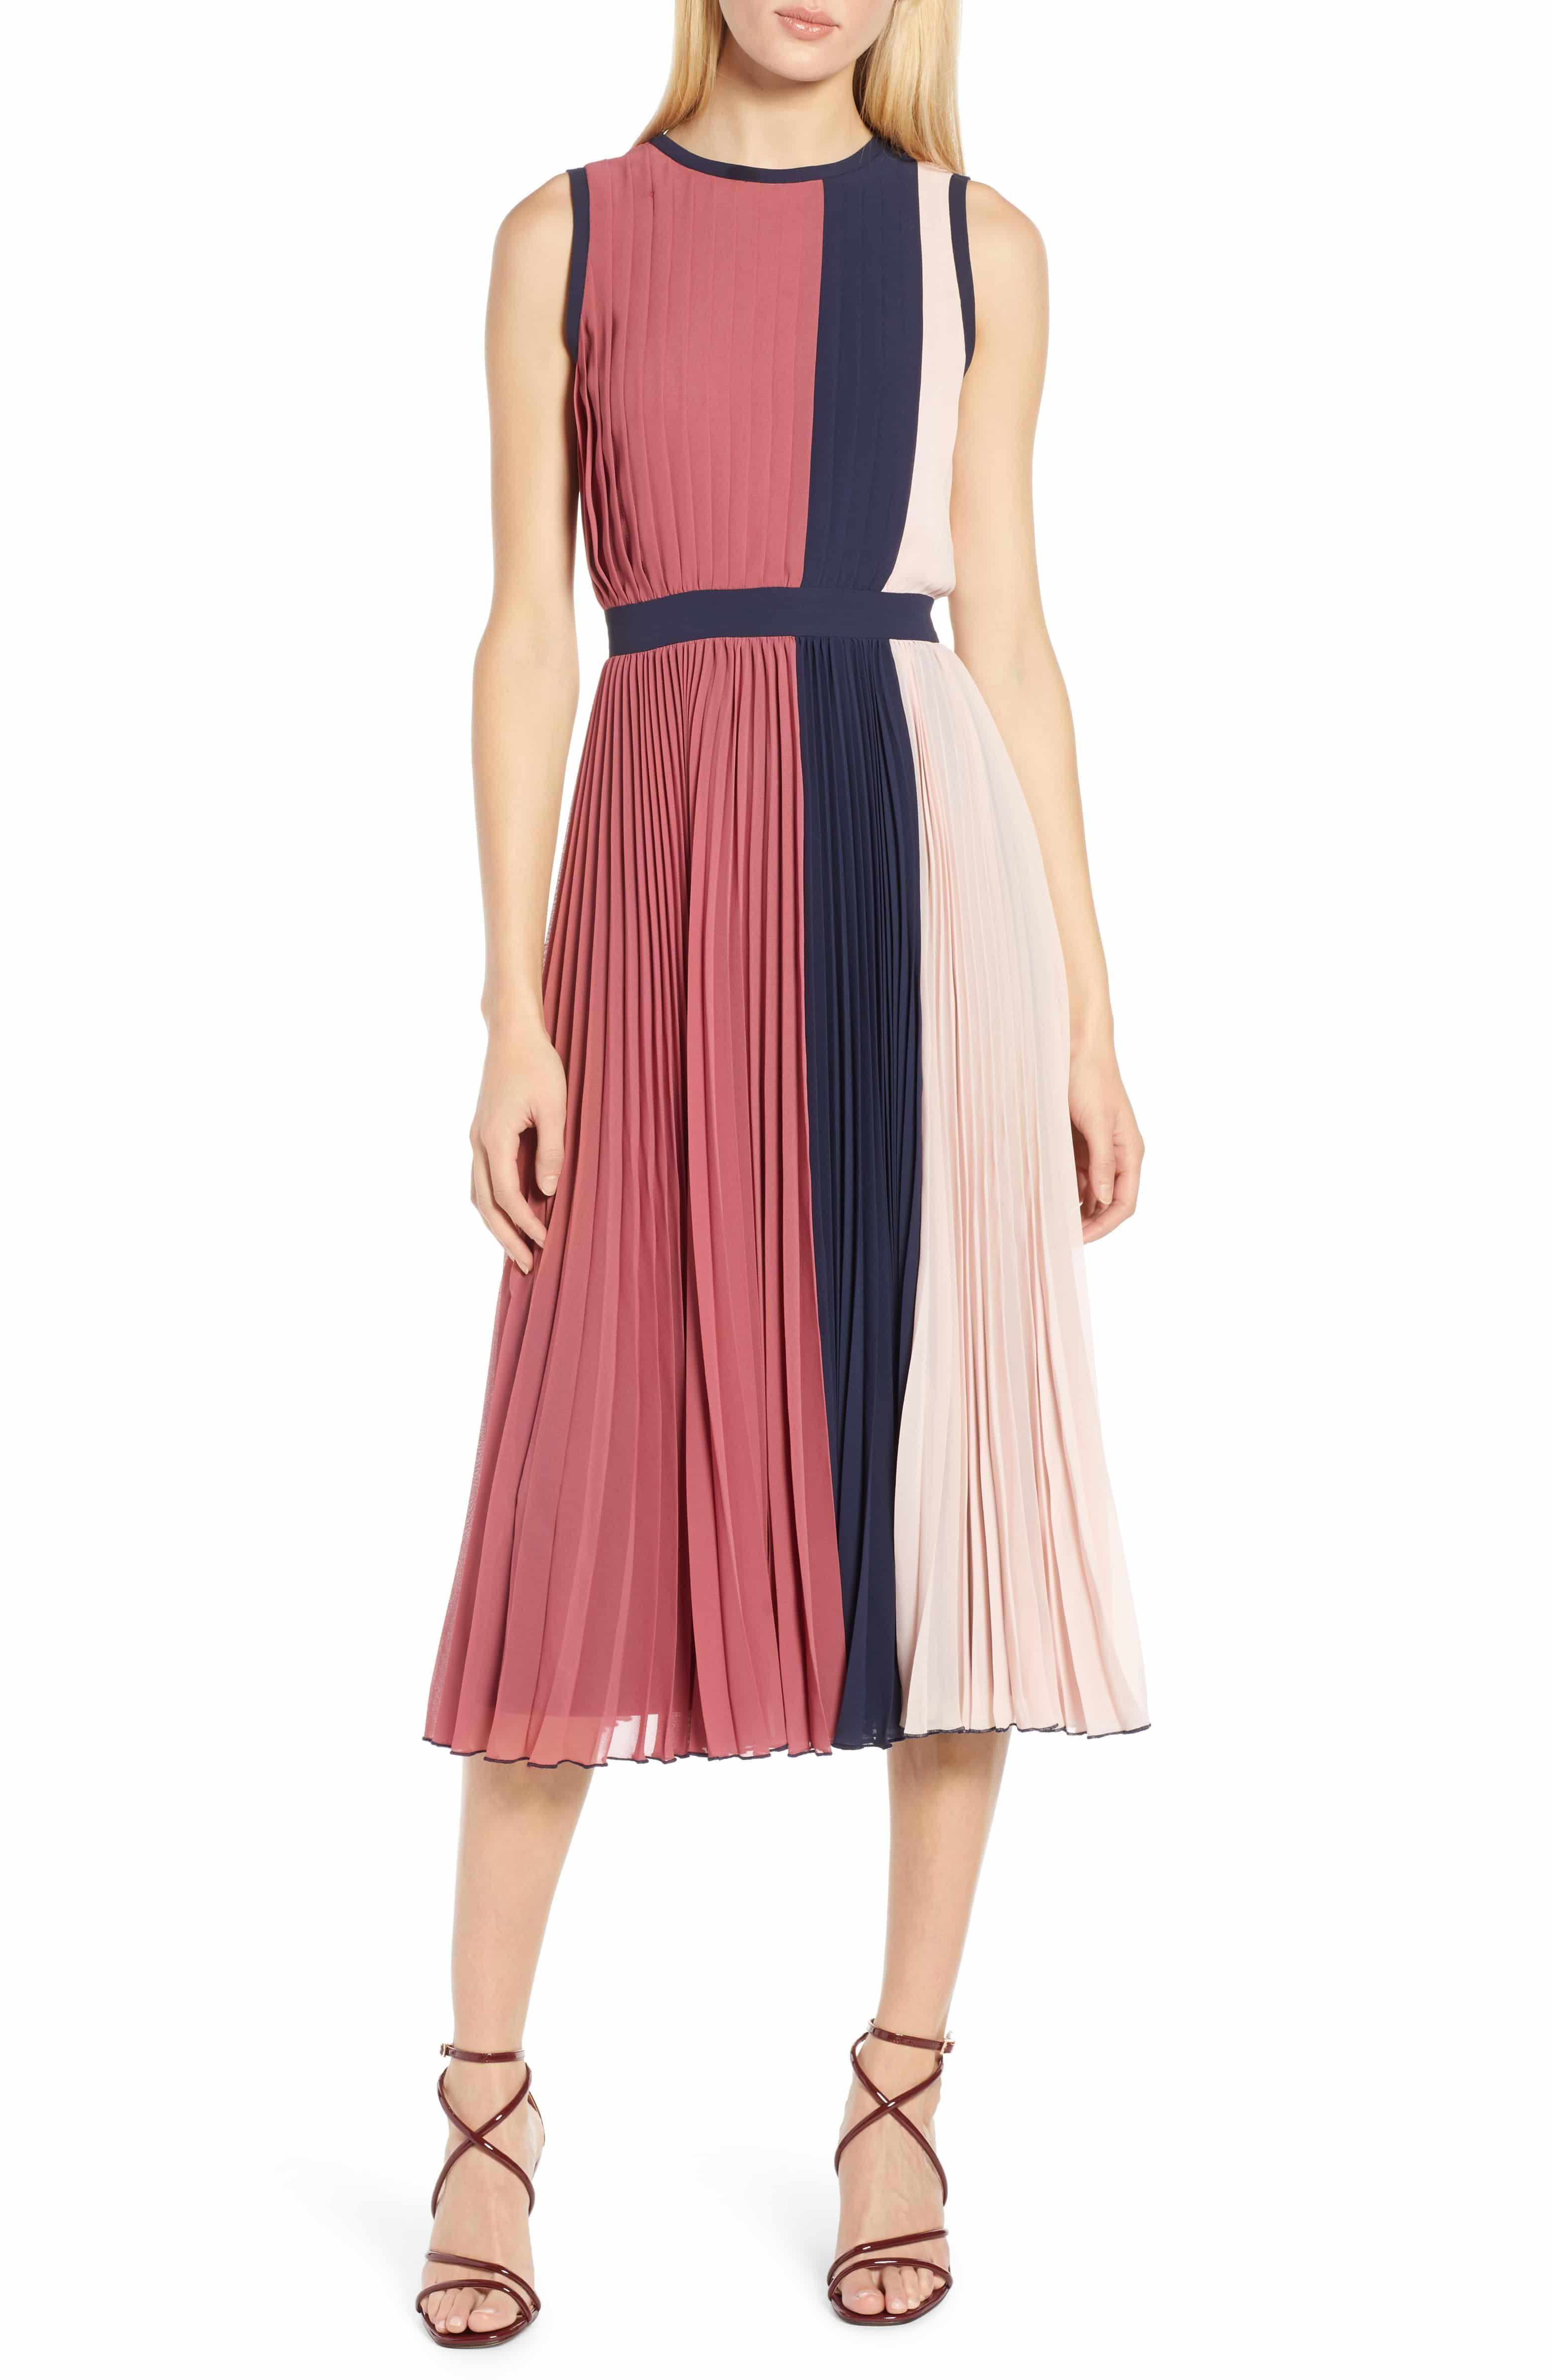 832df2567650 x Atlantic-Pacific Colorblock Pleated Midi Dress, Main, color, PINK- NAVY  COLORBLOCK